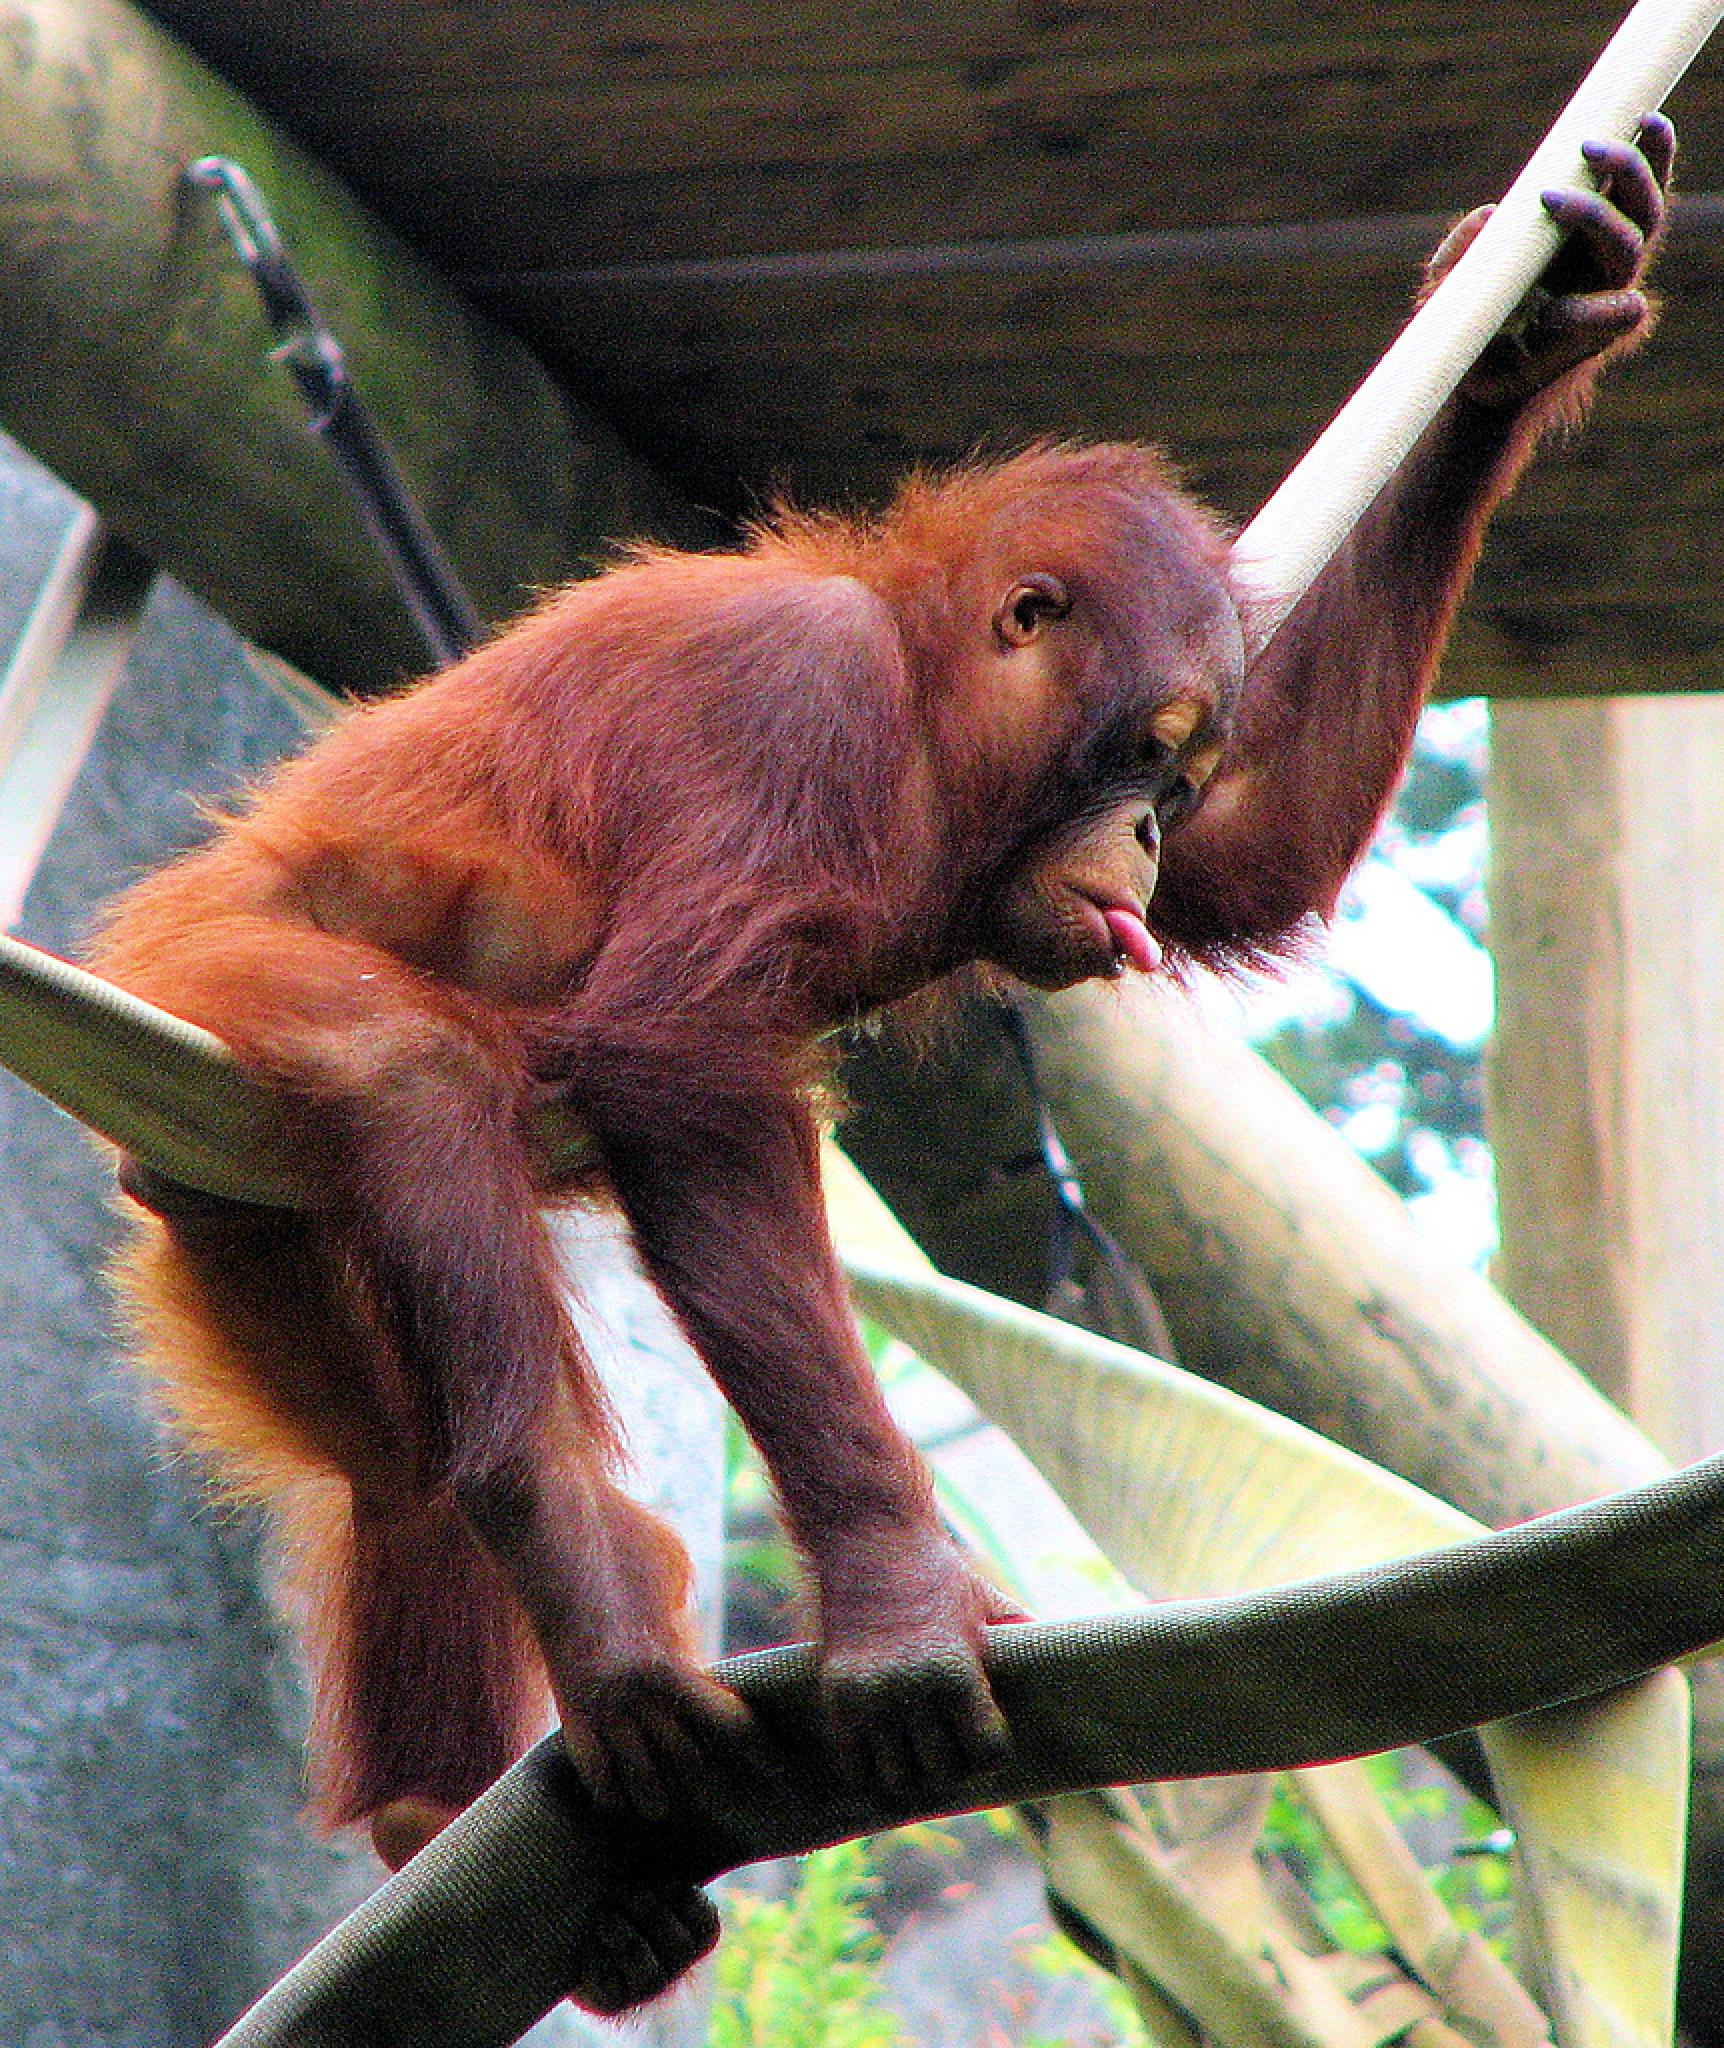 Baby Orangutan Razzberry by holly.afb.smith